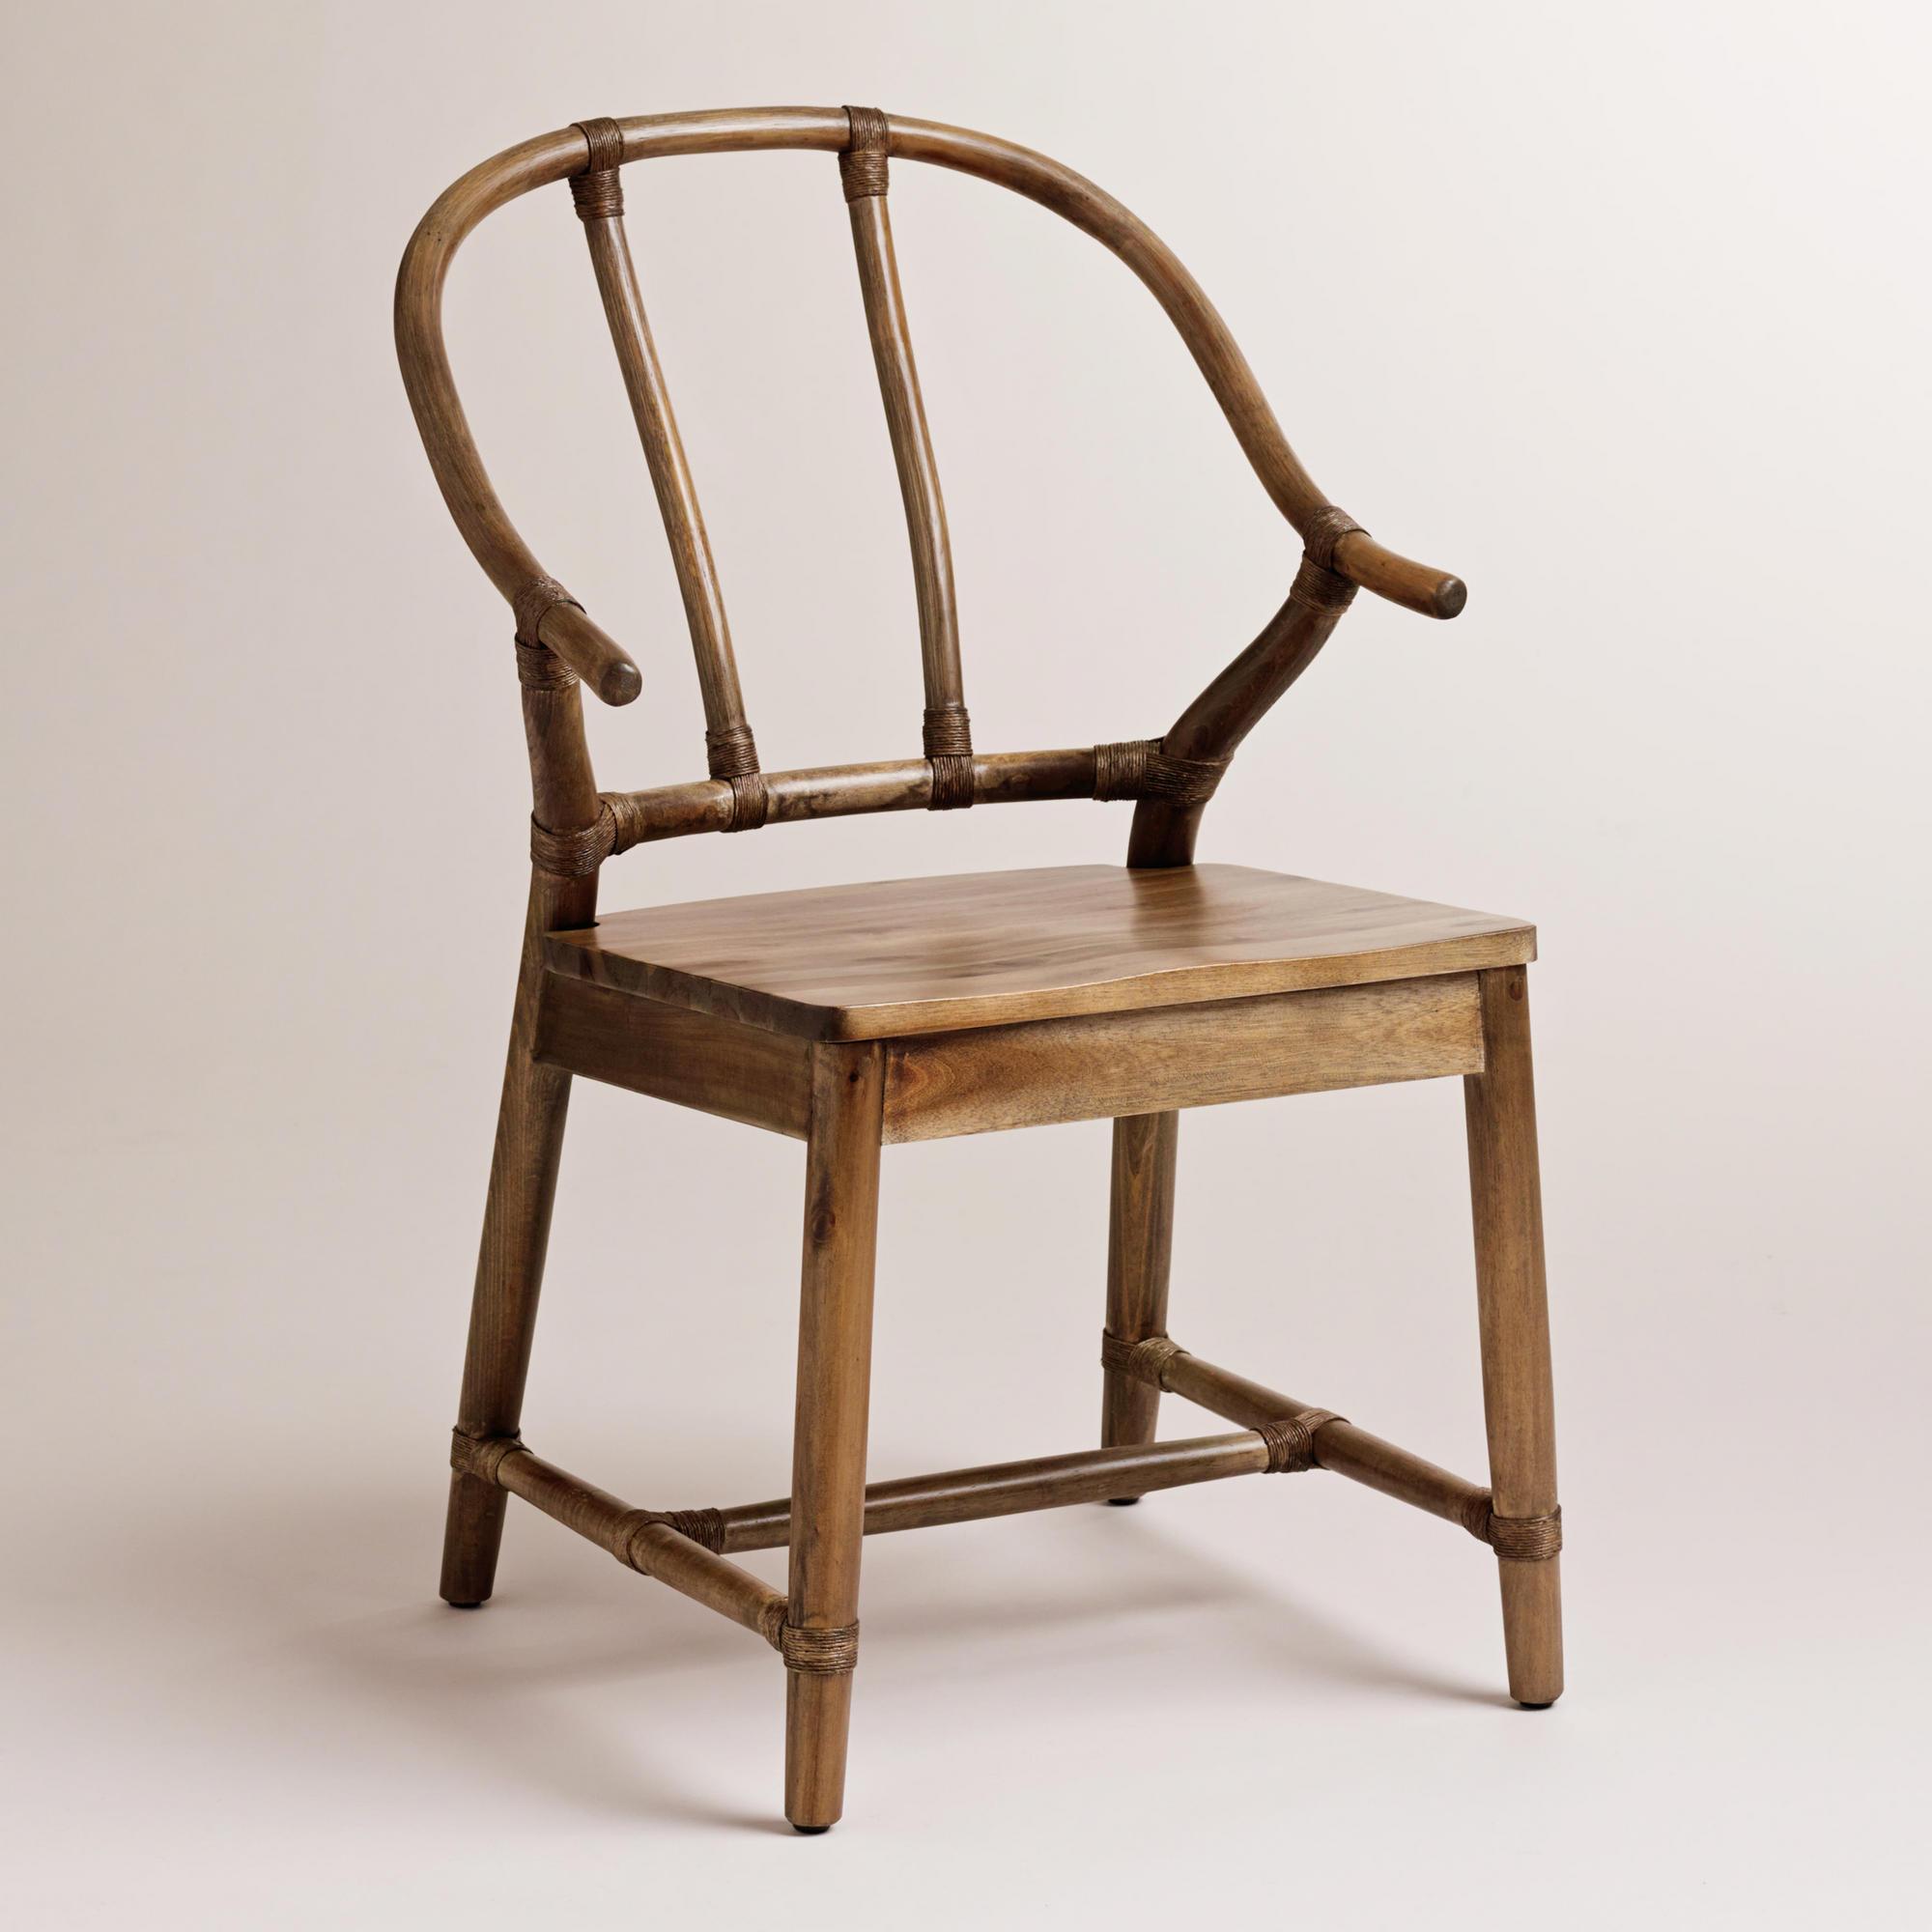 Natural Bowen Wishbone Chair, World Market, $139.99.